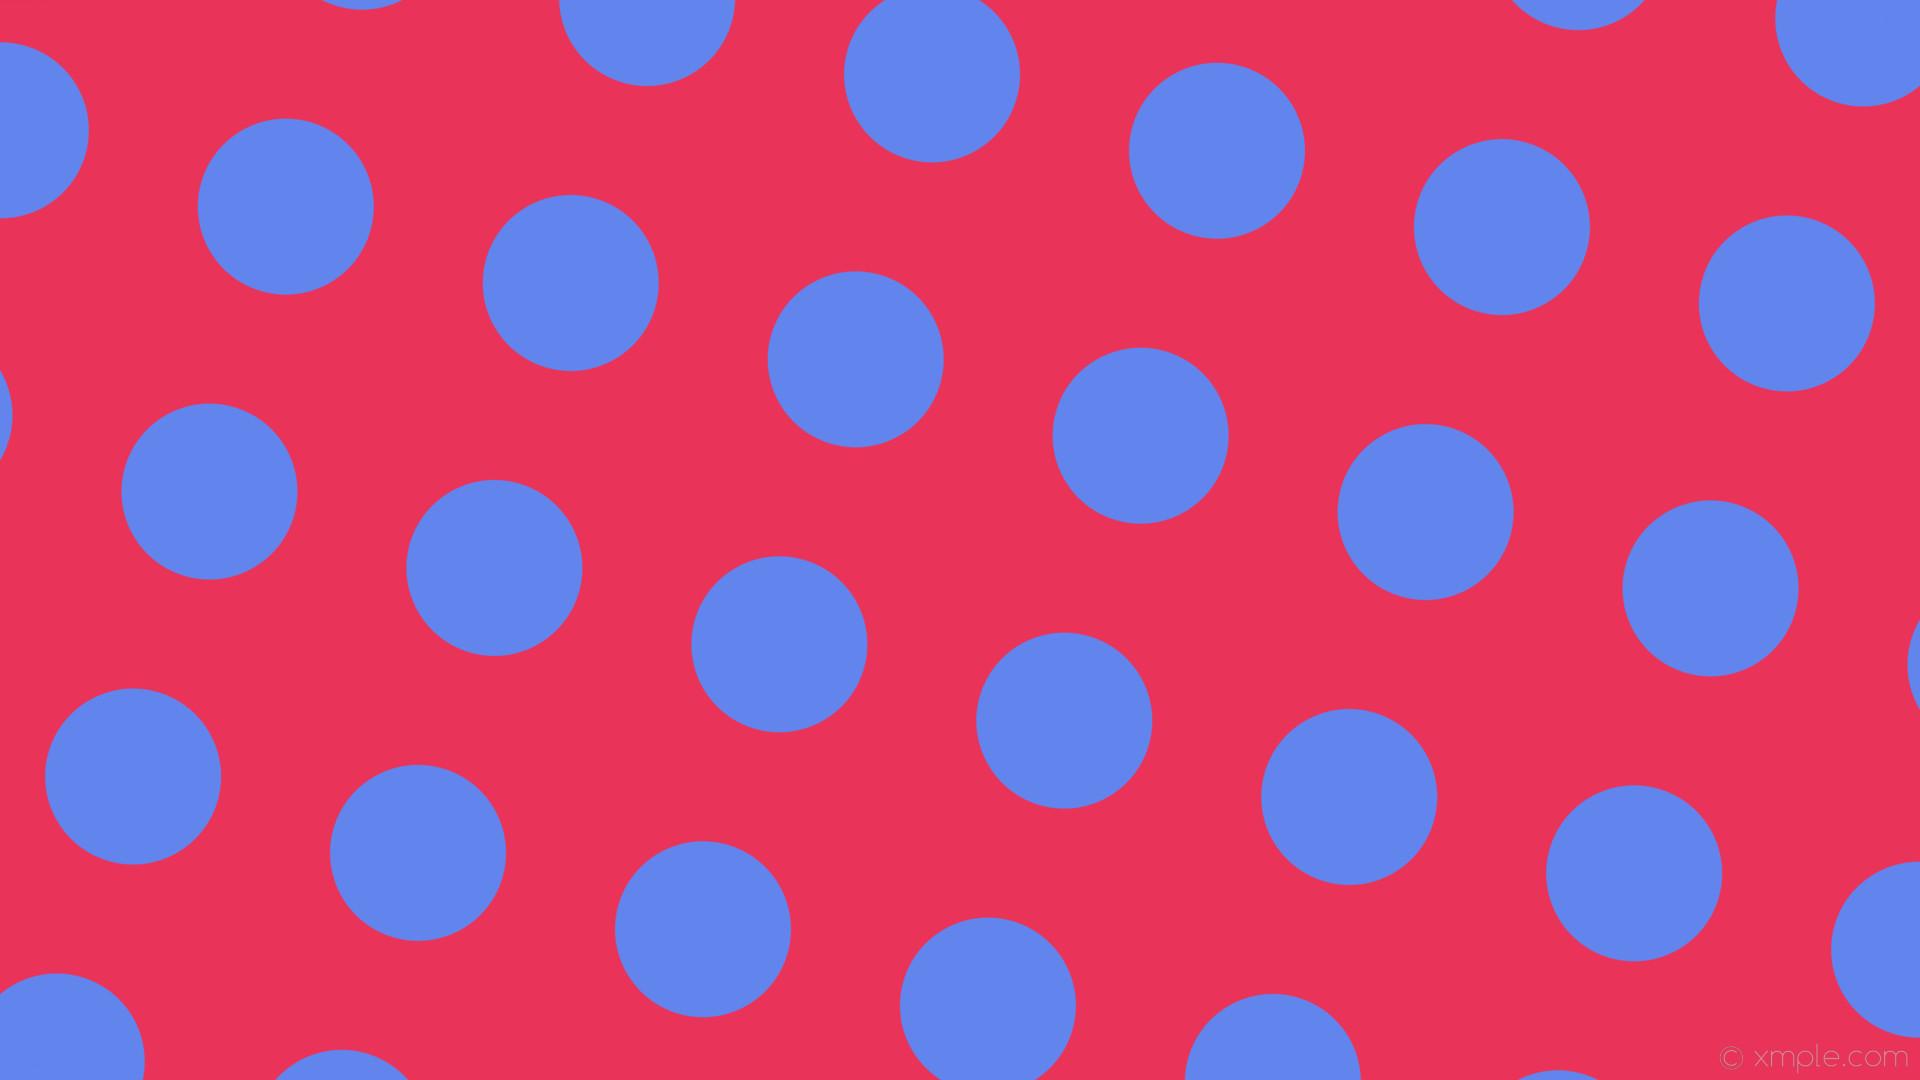 wallpaper spots red polka dots blue #ea3358 #6284ed 345° 176px 295px